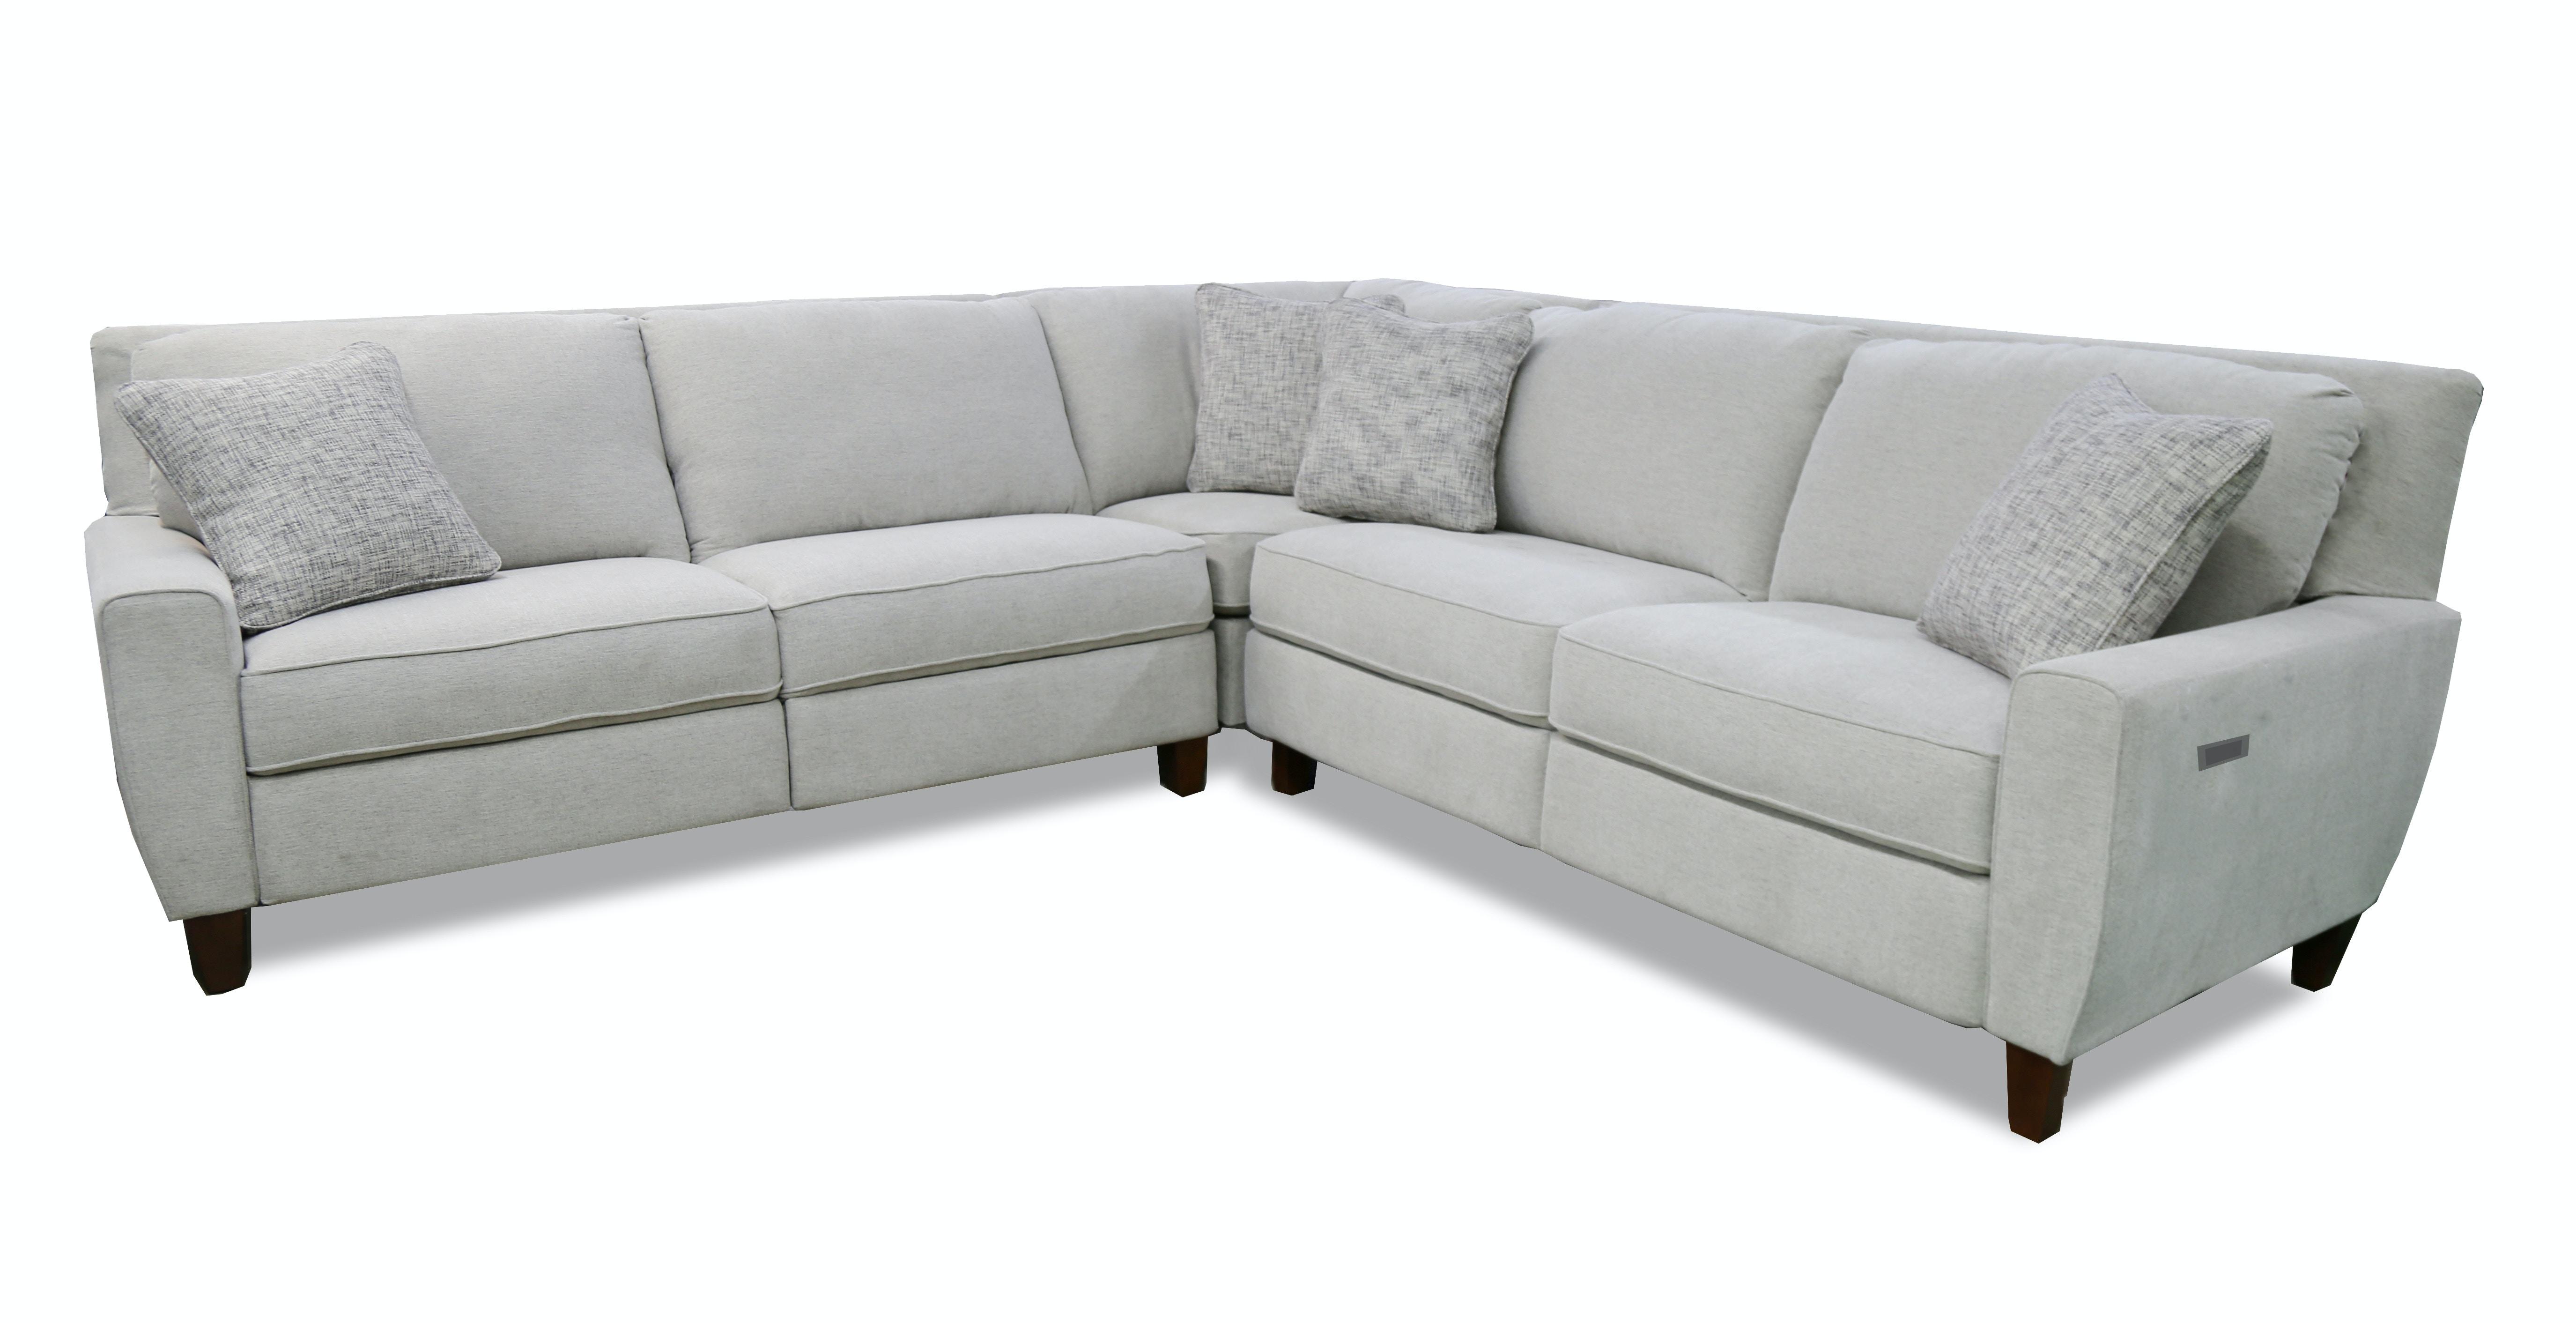 duo edie power reclining sectional la z boy